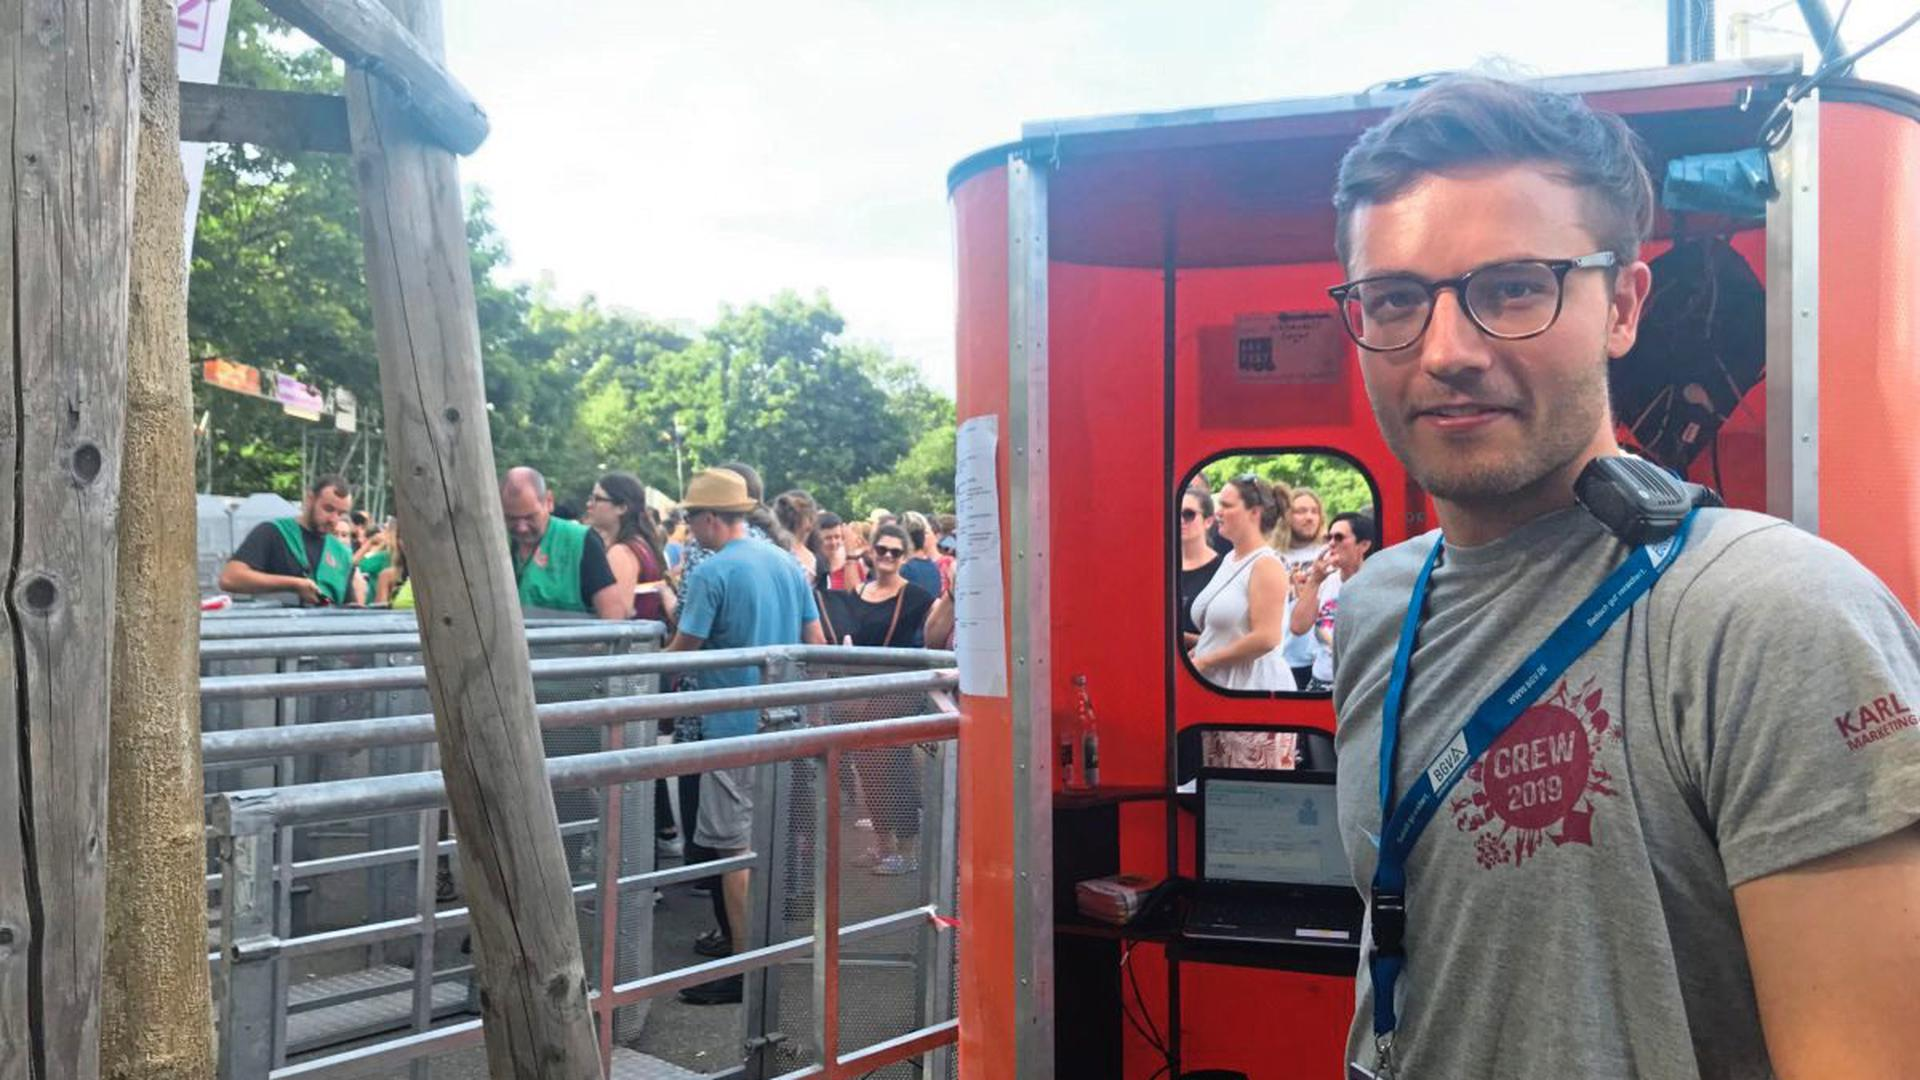 Philipp Manz hält am Einlass an der Europahalle Ausschau nach gefälschten Tickets.